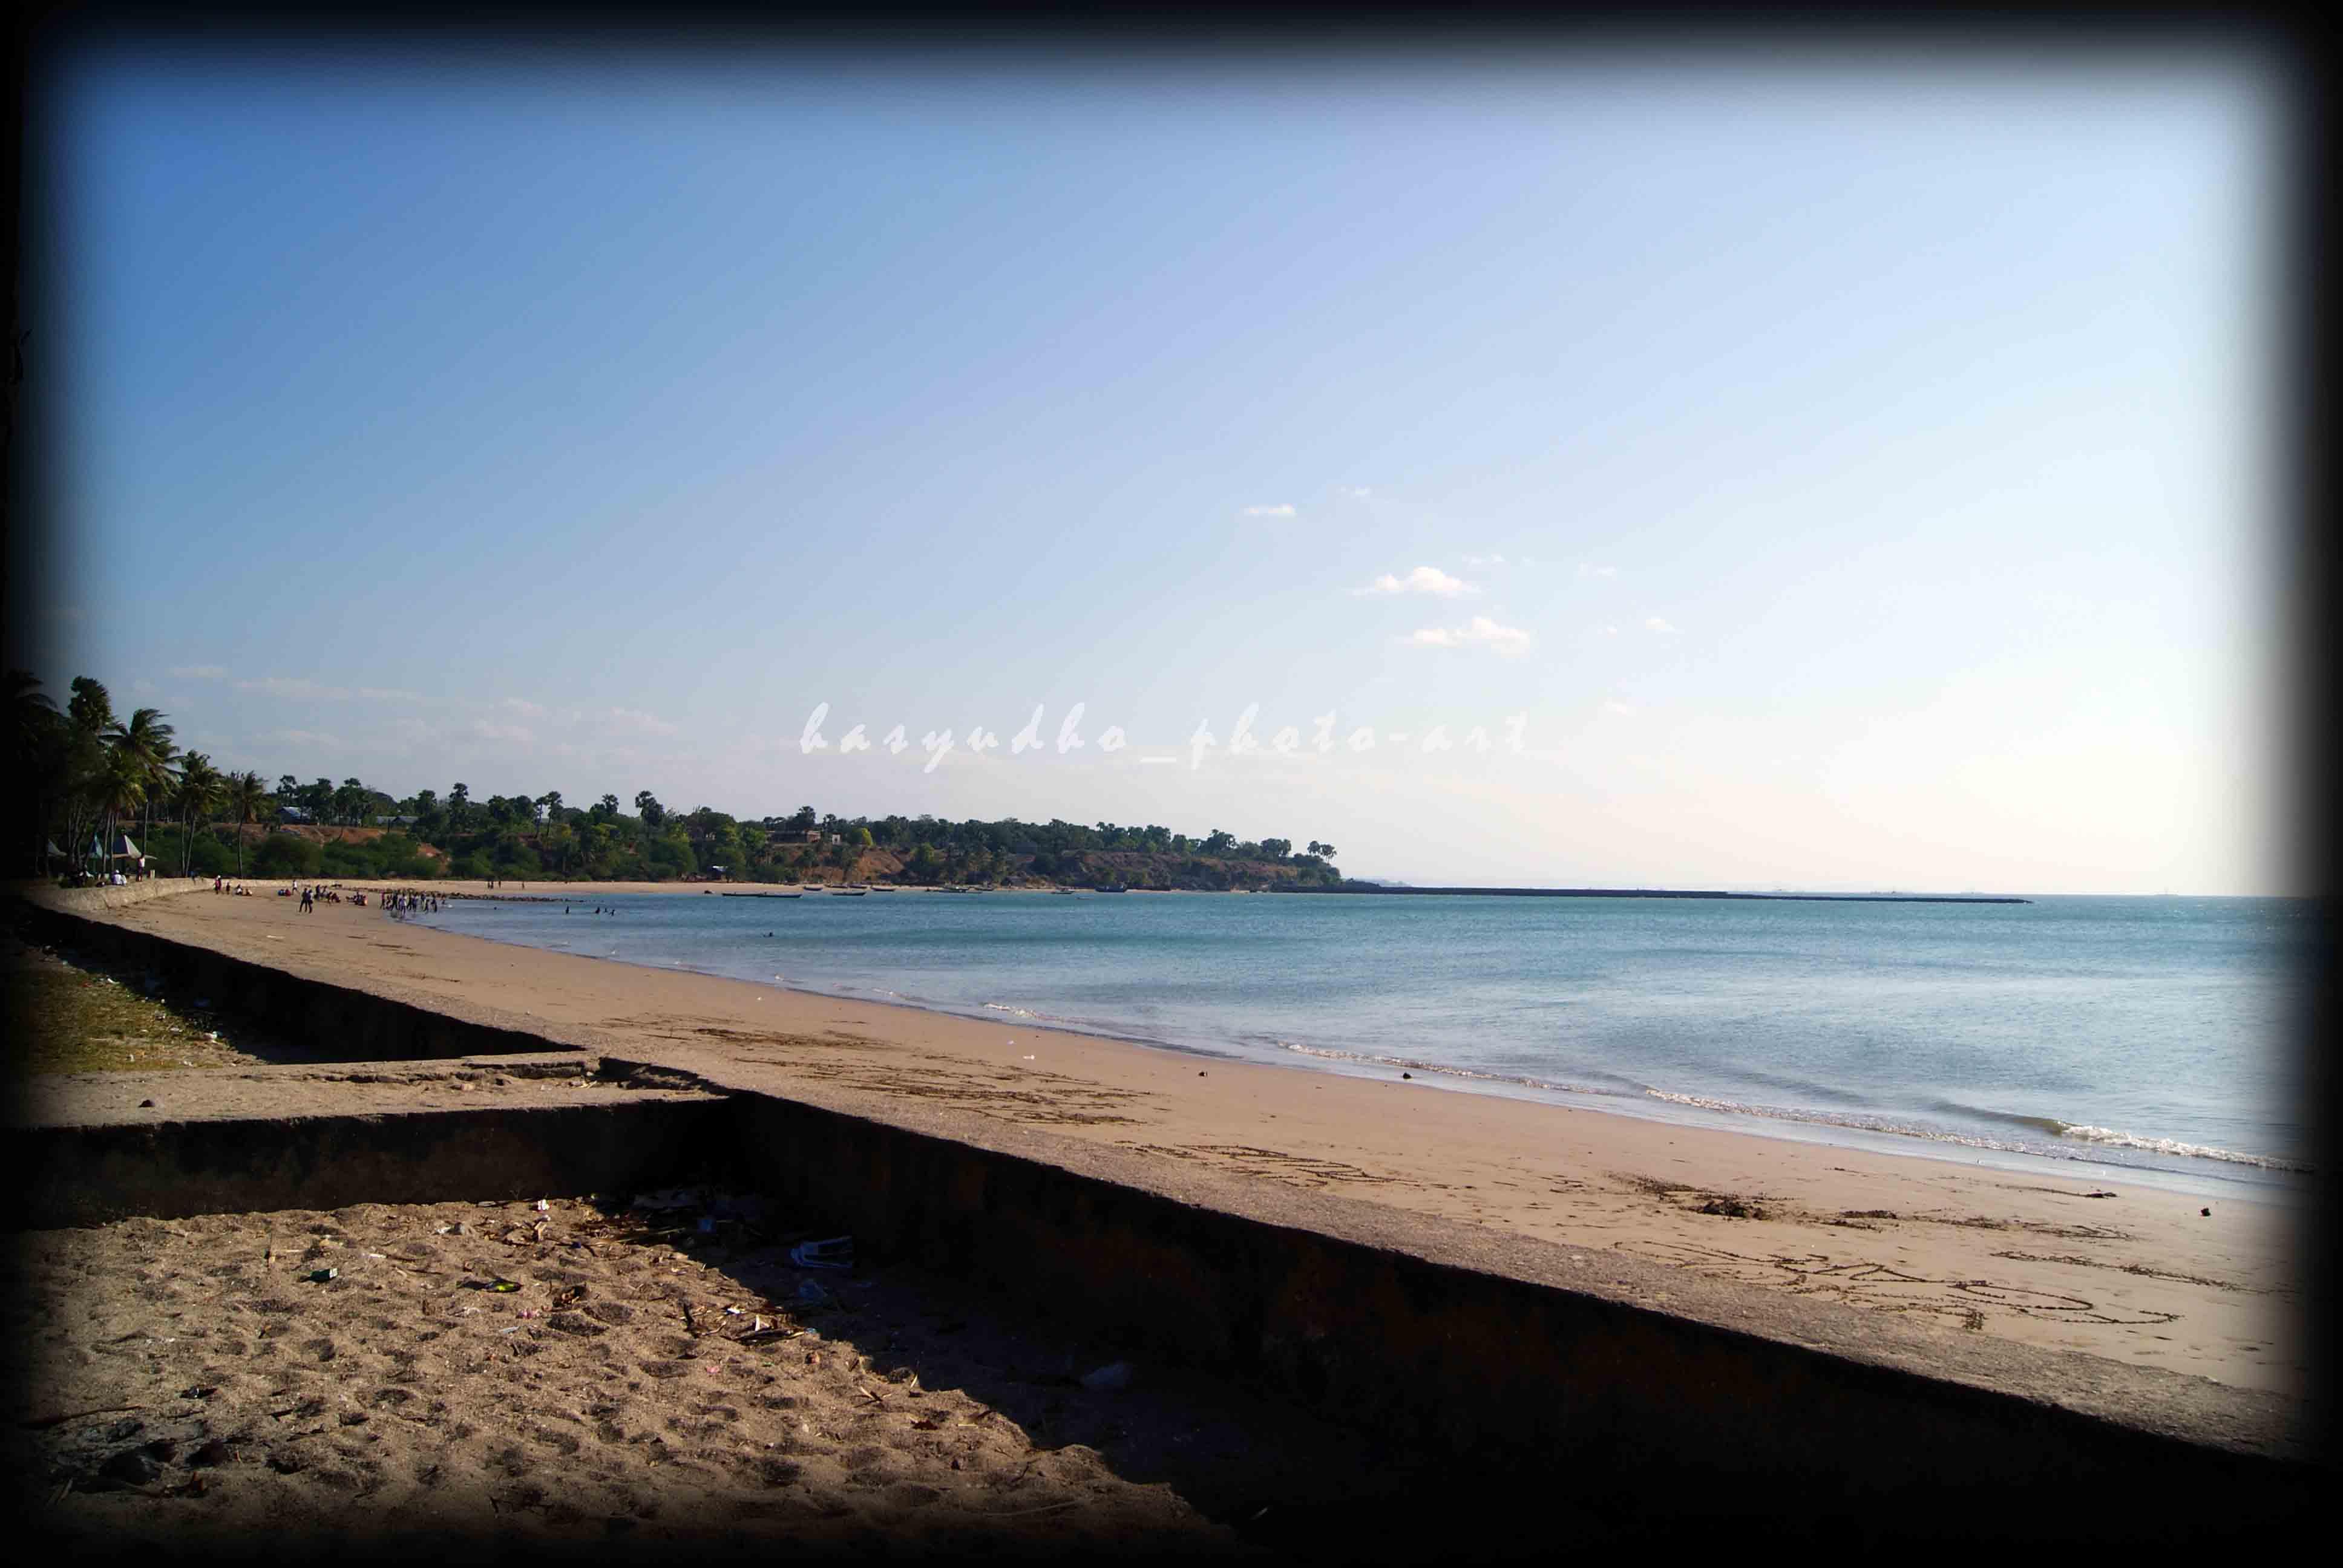 Pantai Lasiana Indah Timur Kota Kupang Hasyudho Setelah Masuk Kawasan